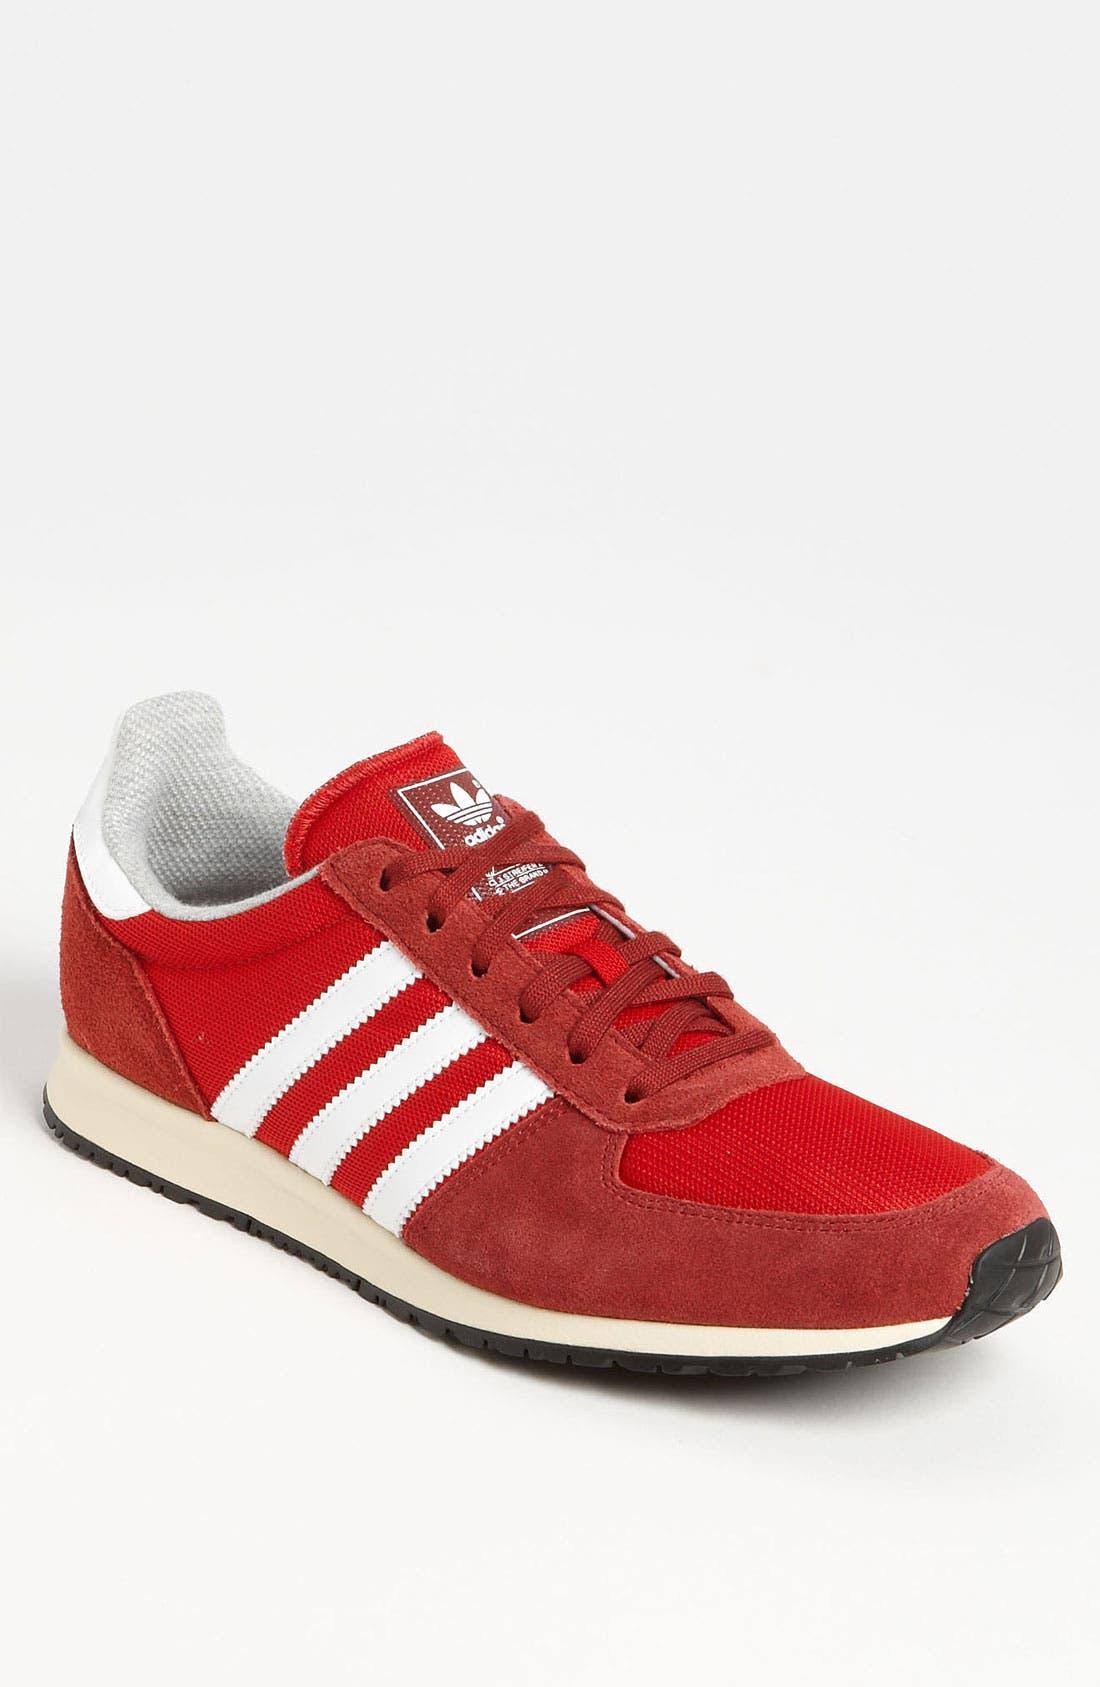 Main Image - adidas 'Adistar Racer' Sneaker (Men)